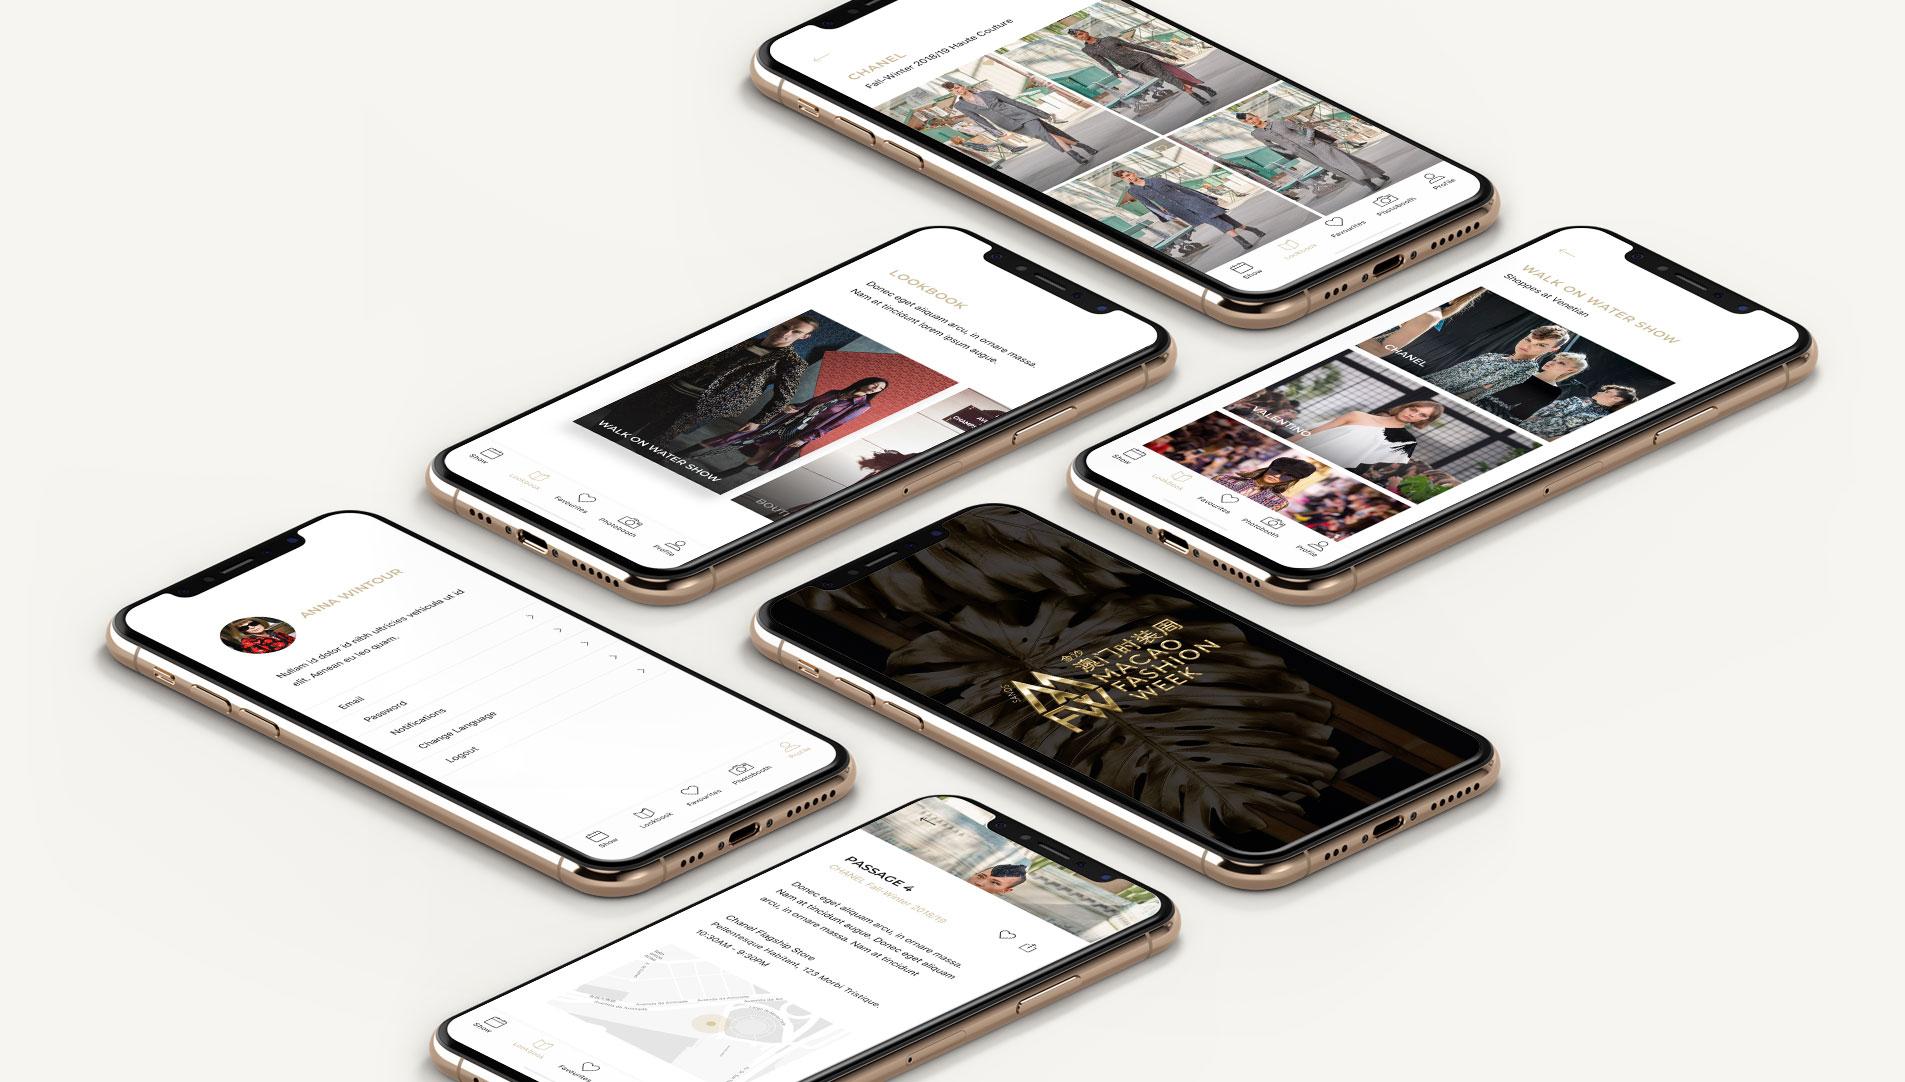 app development hk SMFW slideshow 03